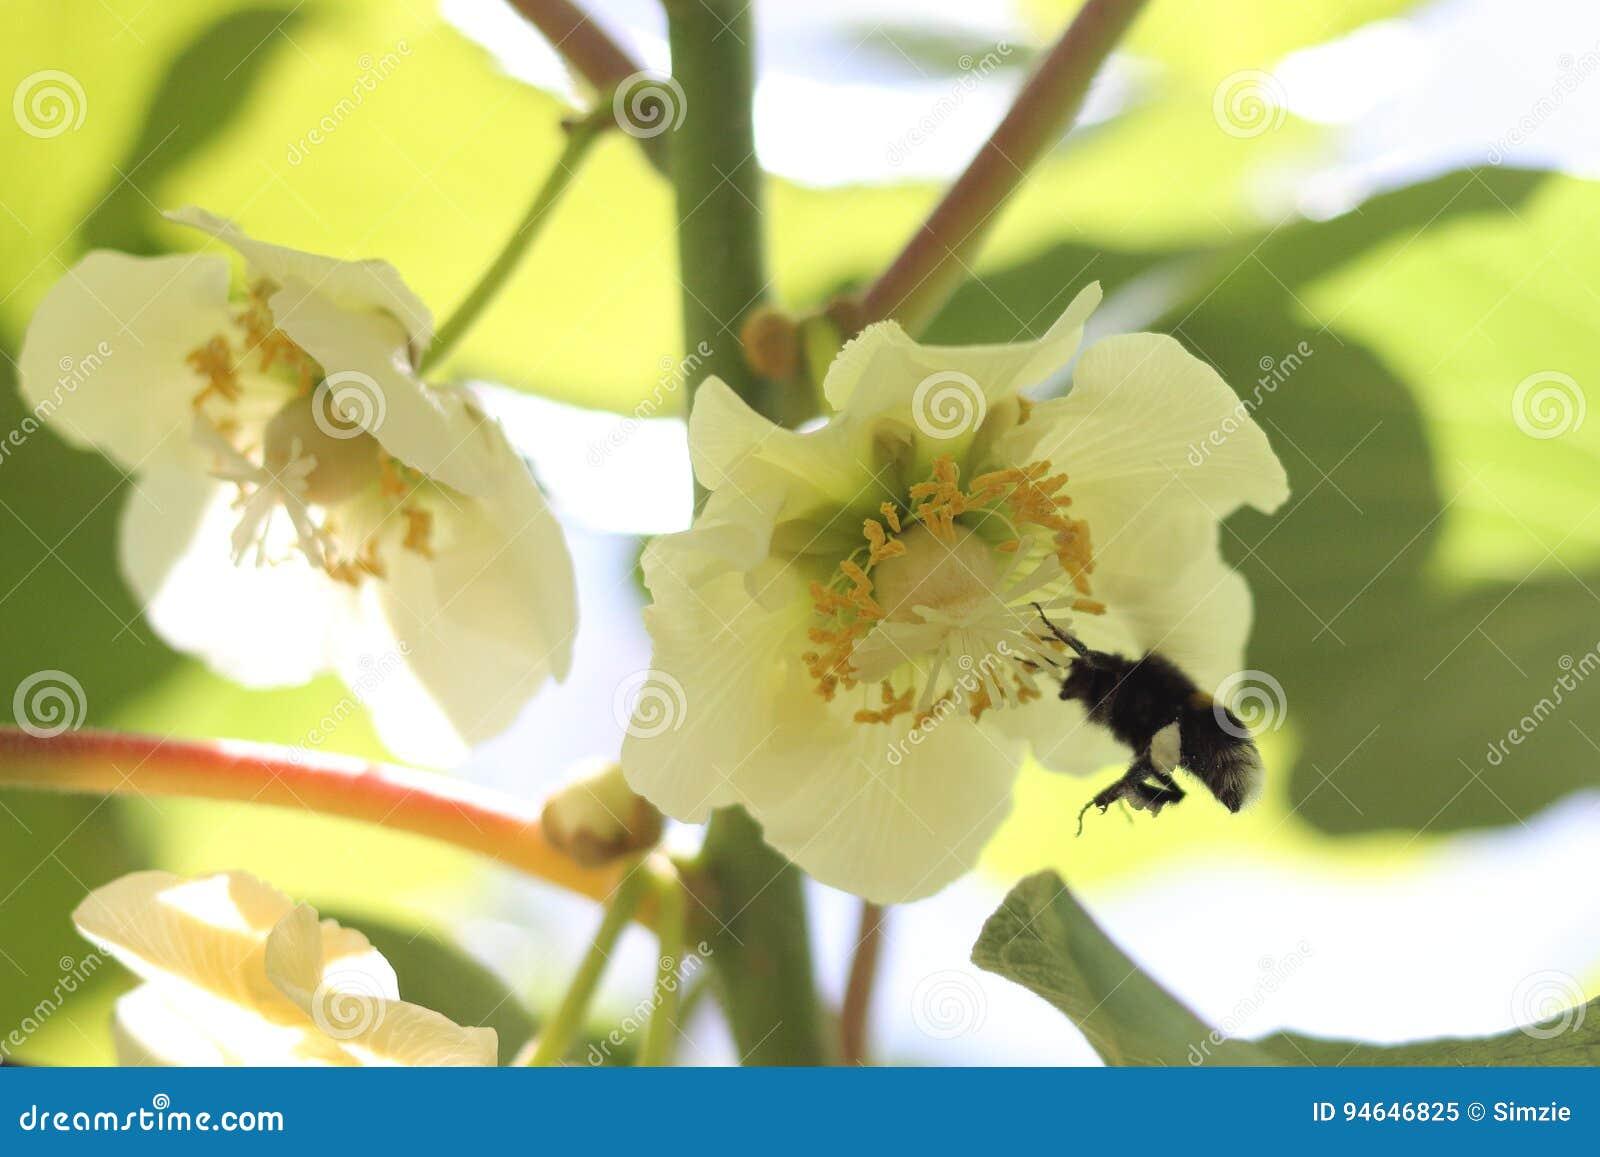 Bumblebee Pollinating In Kiwifruit Orchard Stock Image Image Of